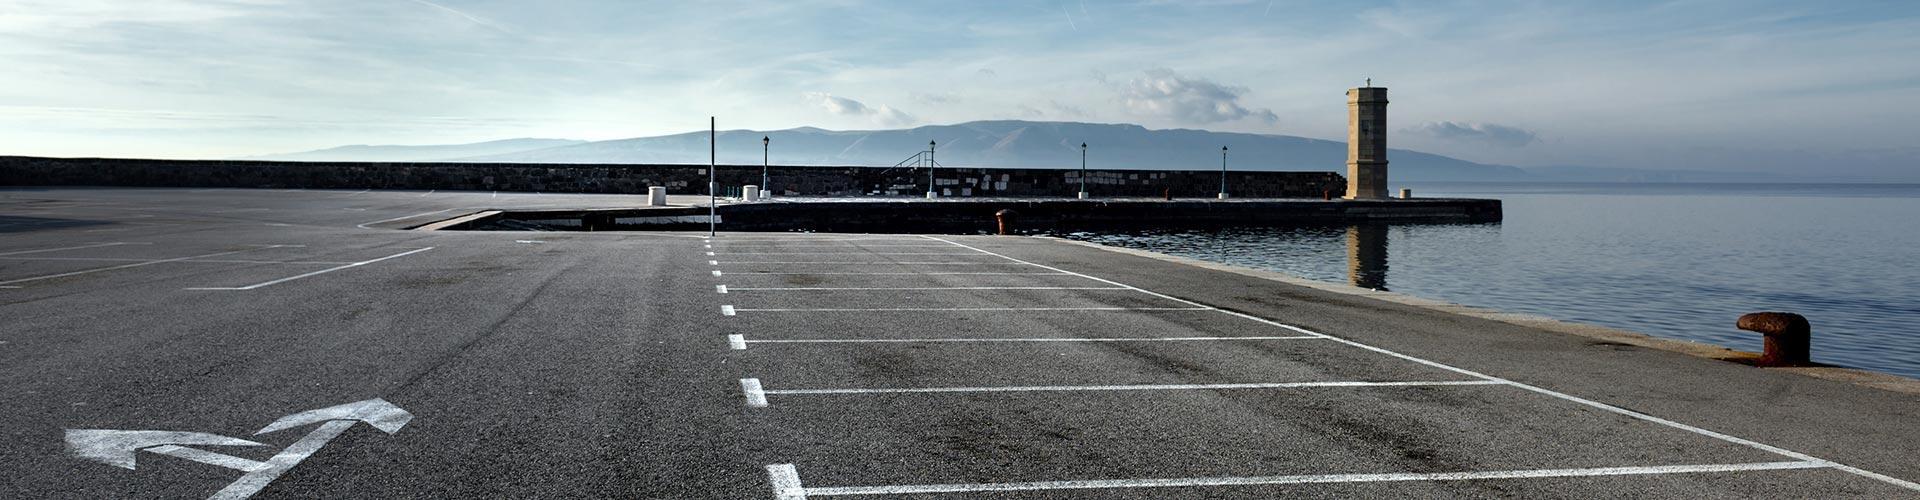 car park line marking at sea port